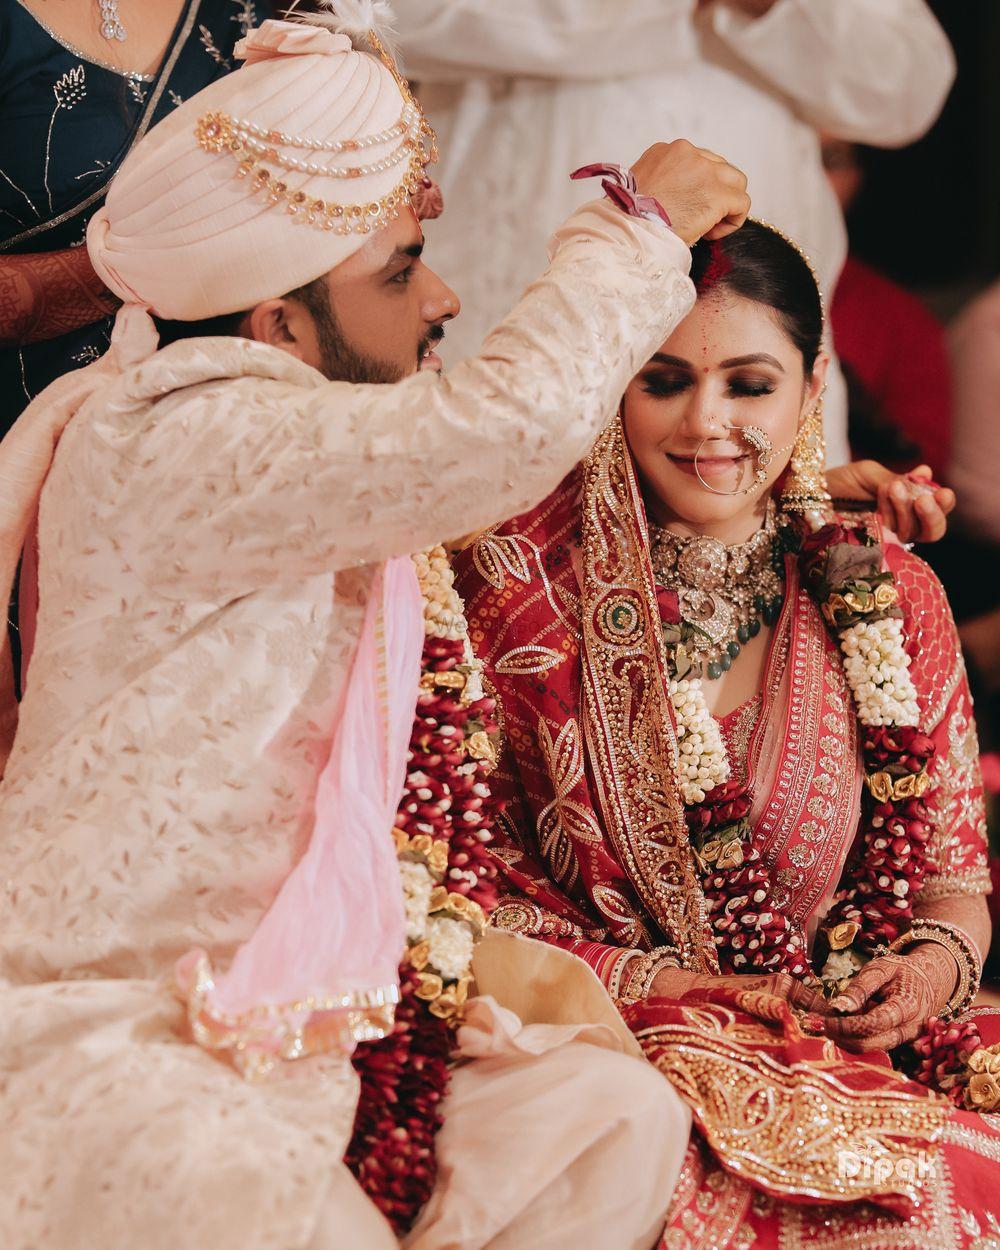 Photo From Couples #Dipak Studios 2020-2021 - By Dipak Studios